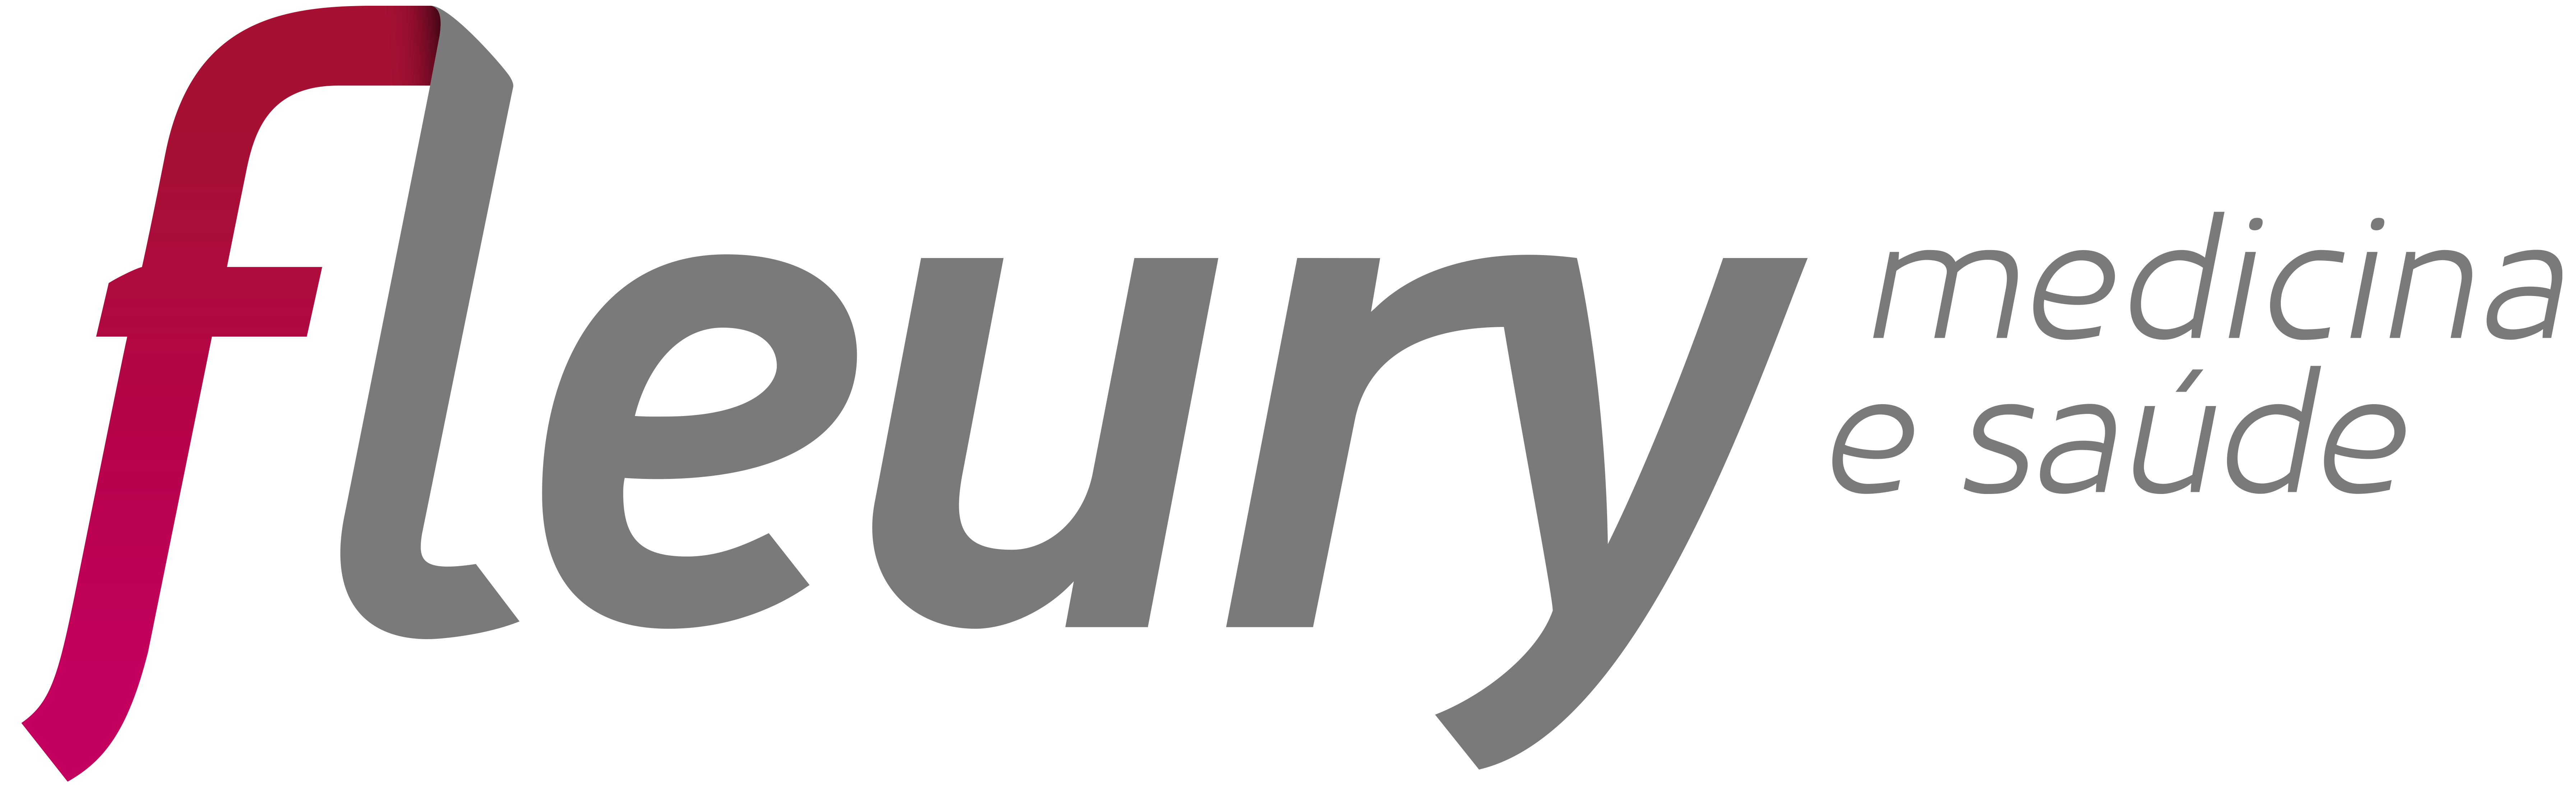 Fleury S.A.